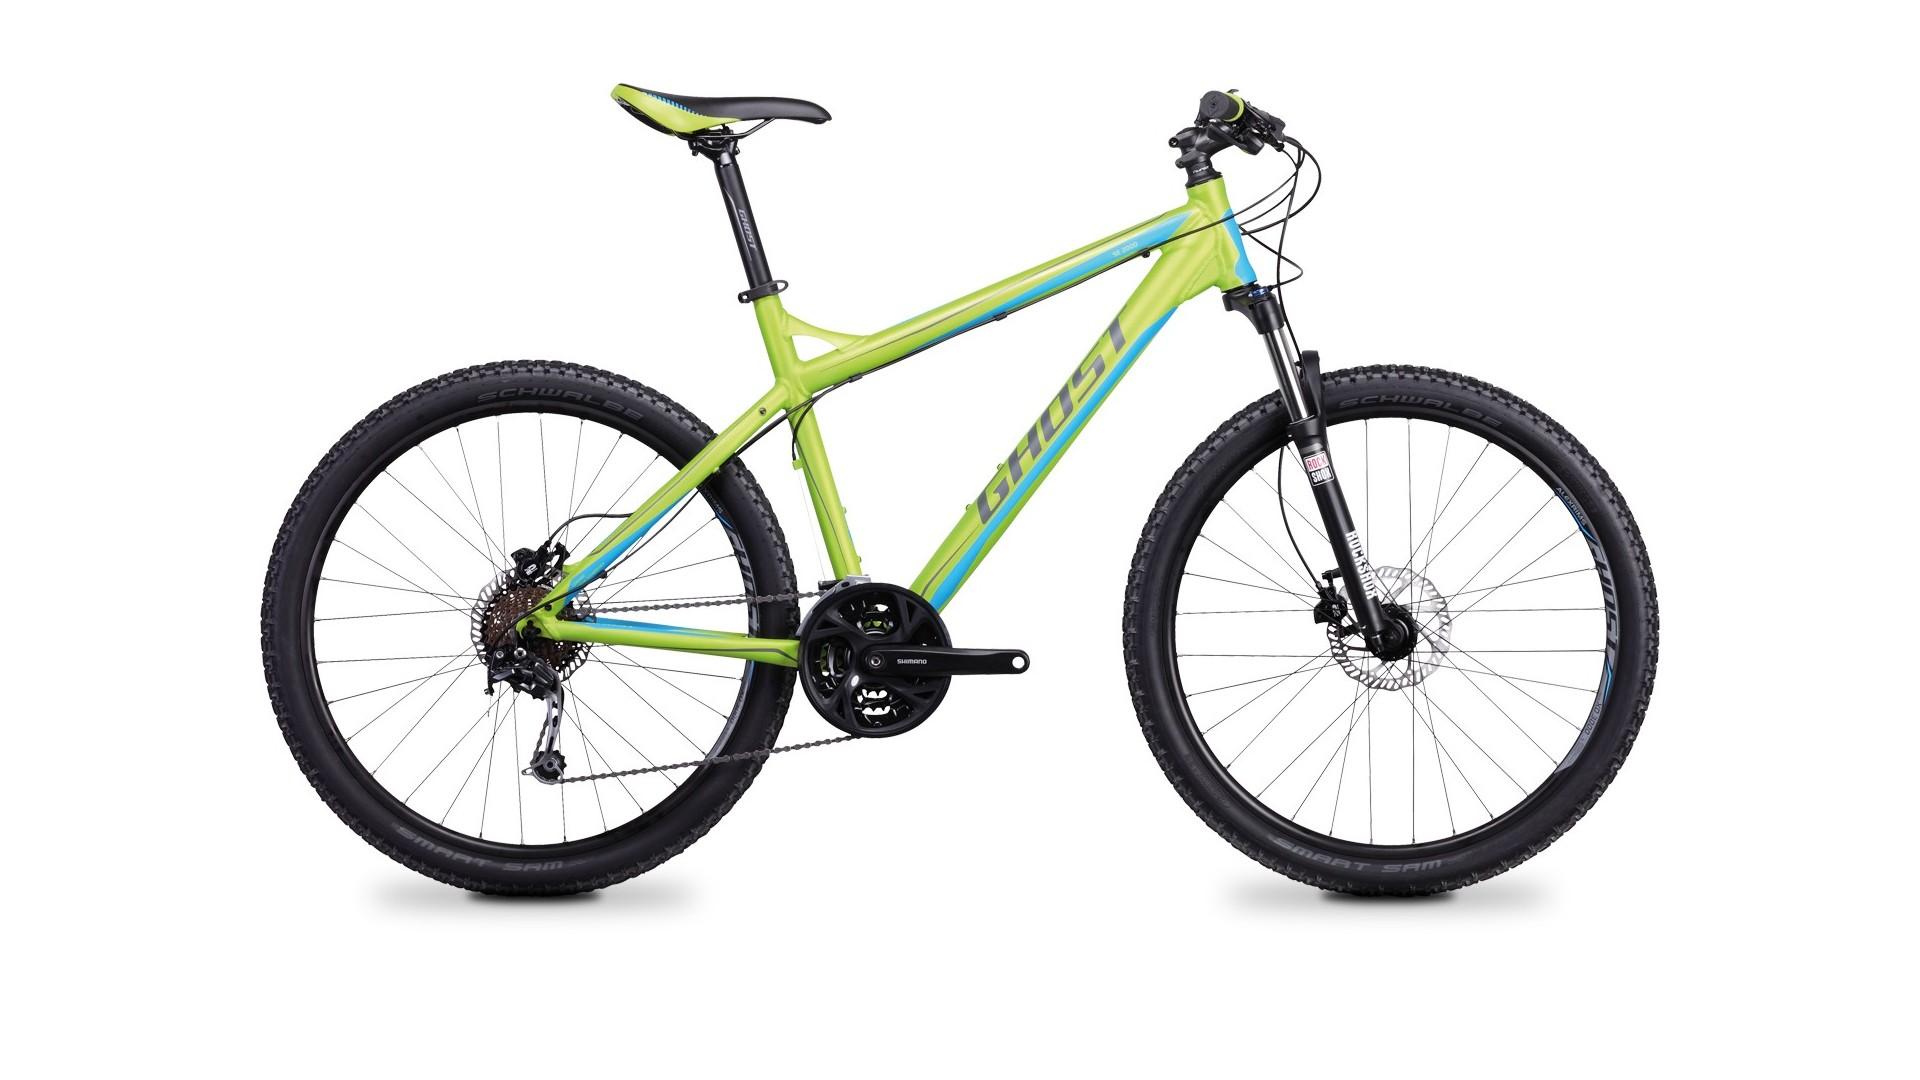 Велосипед GHOST E 2000 green/grey/blue год 2017